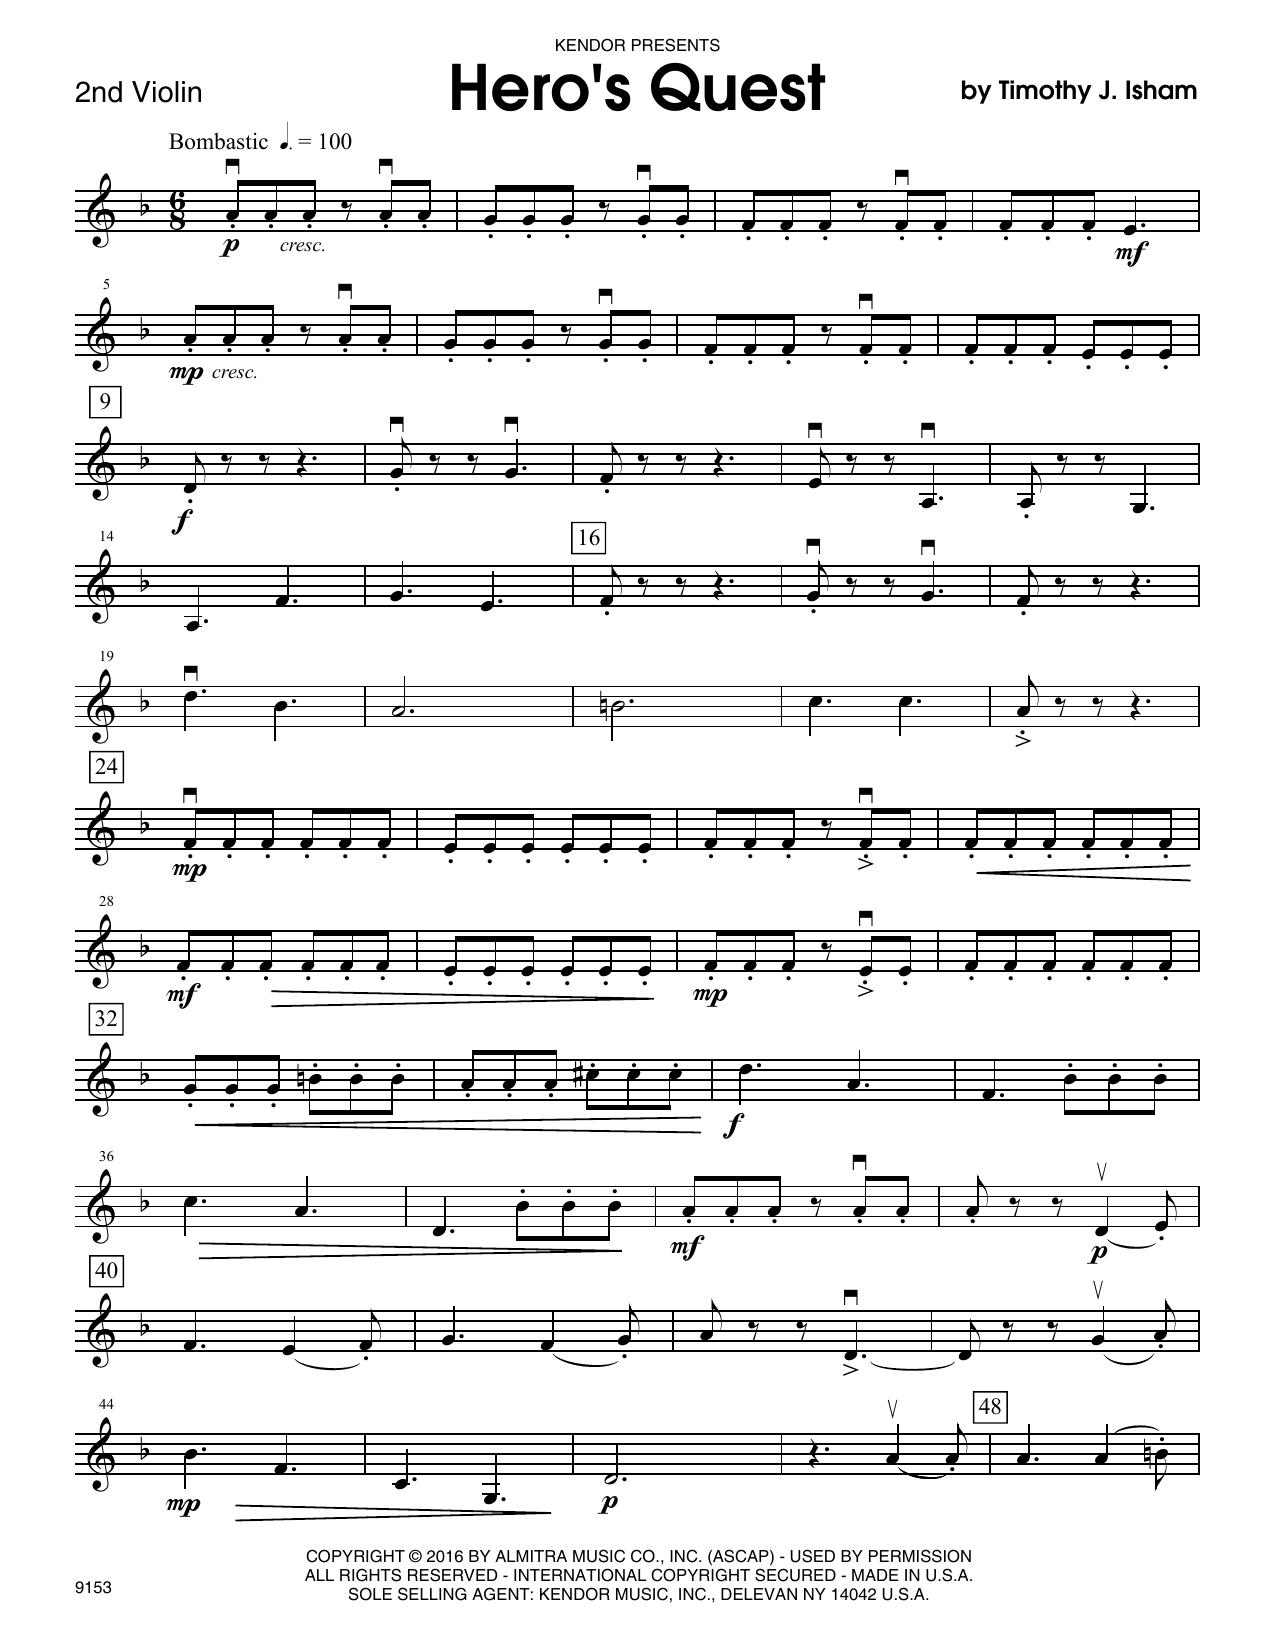 Hero's Quest - 2nd Violin Sheet Music